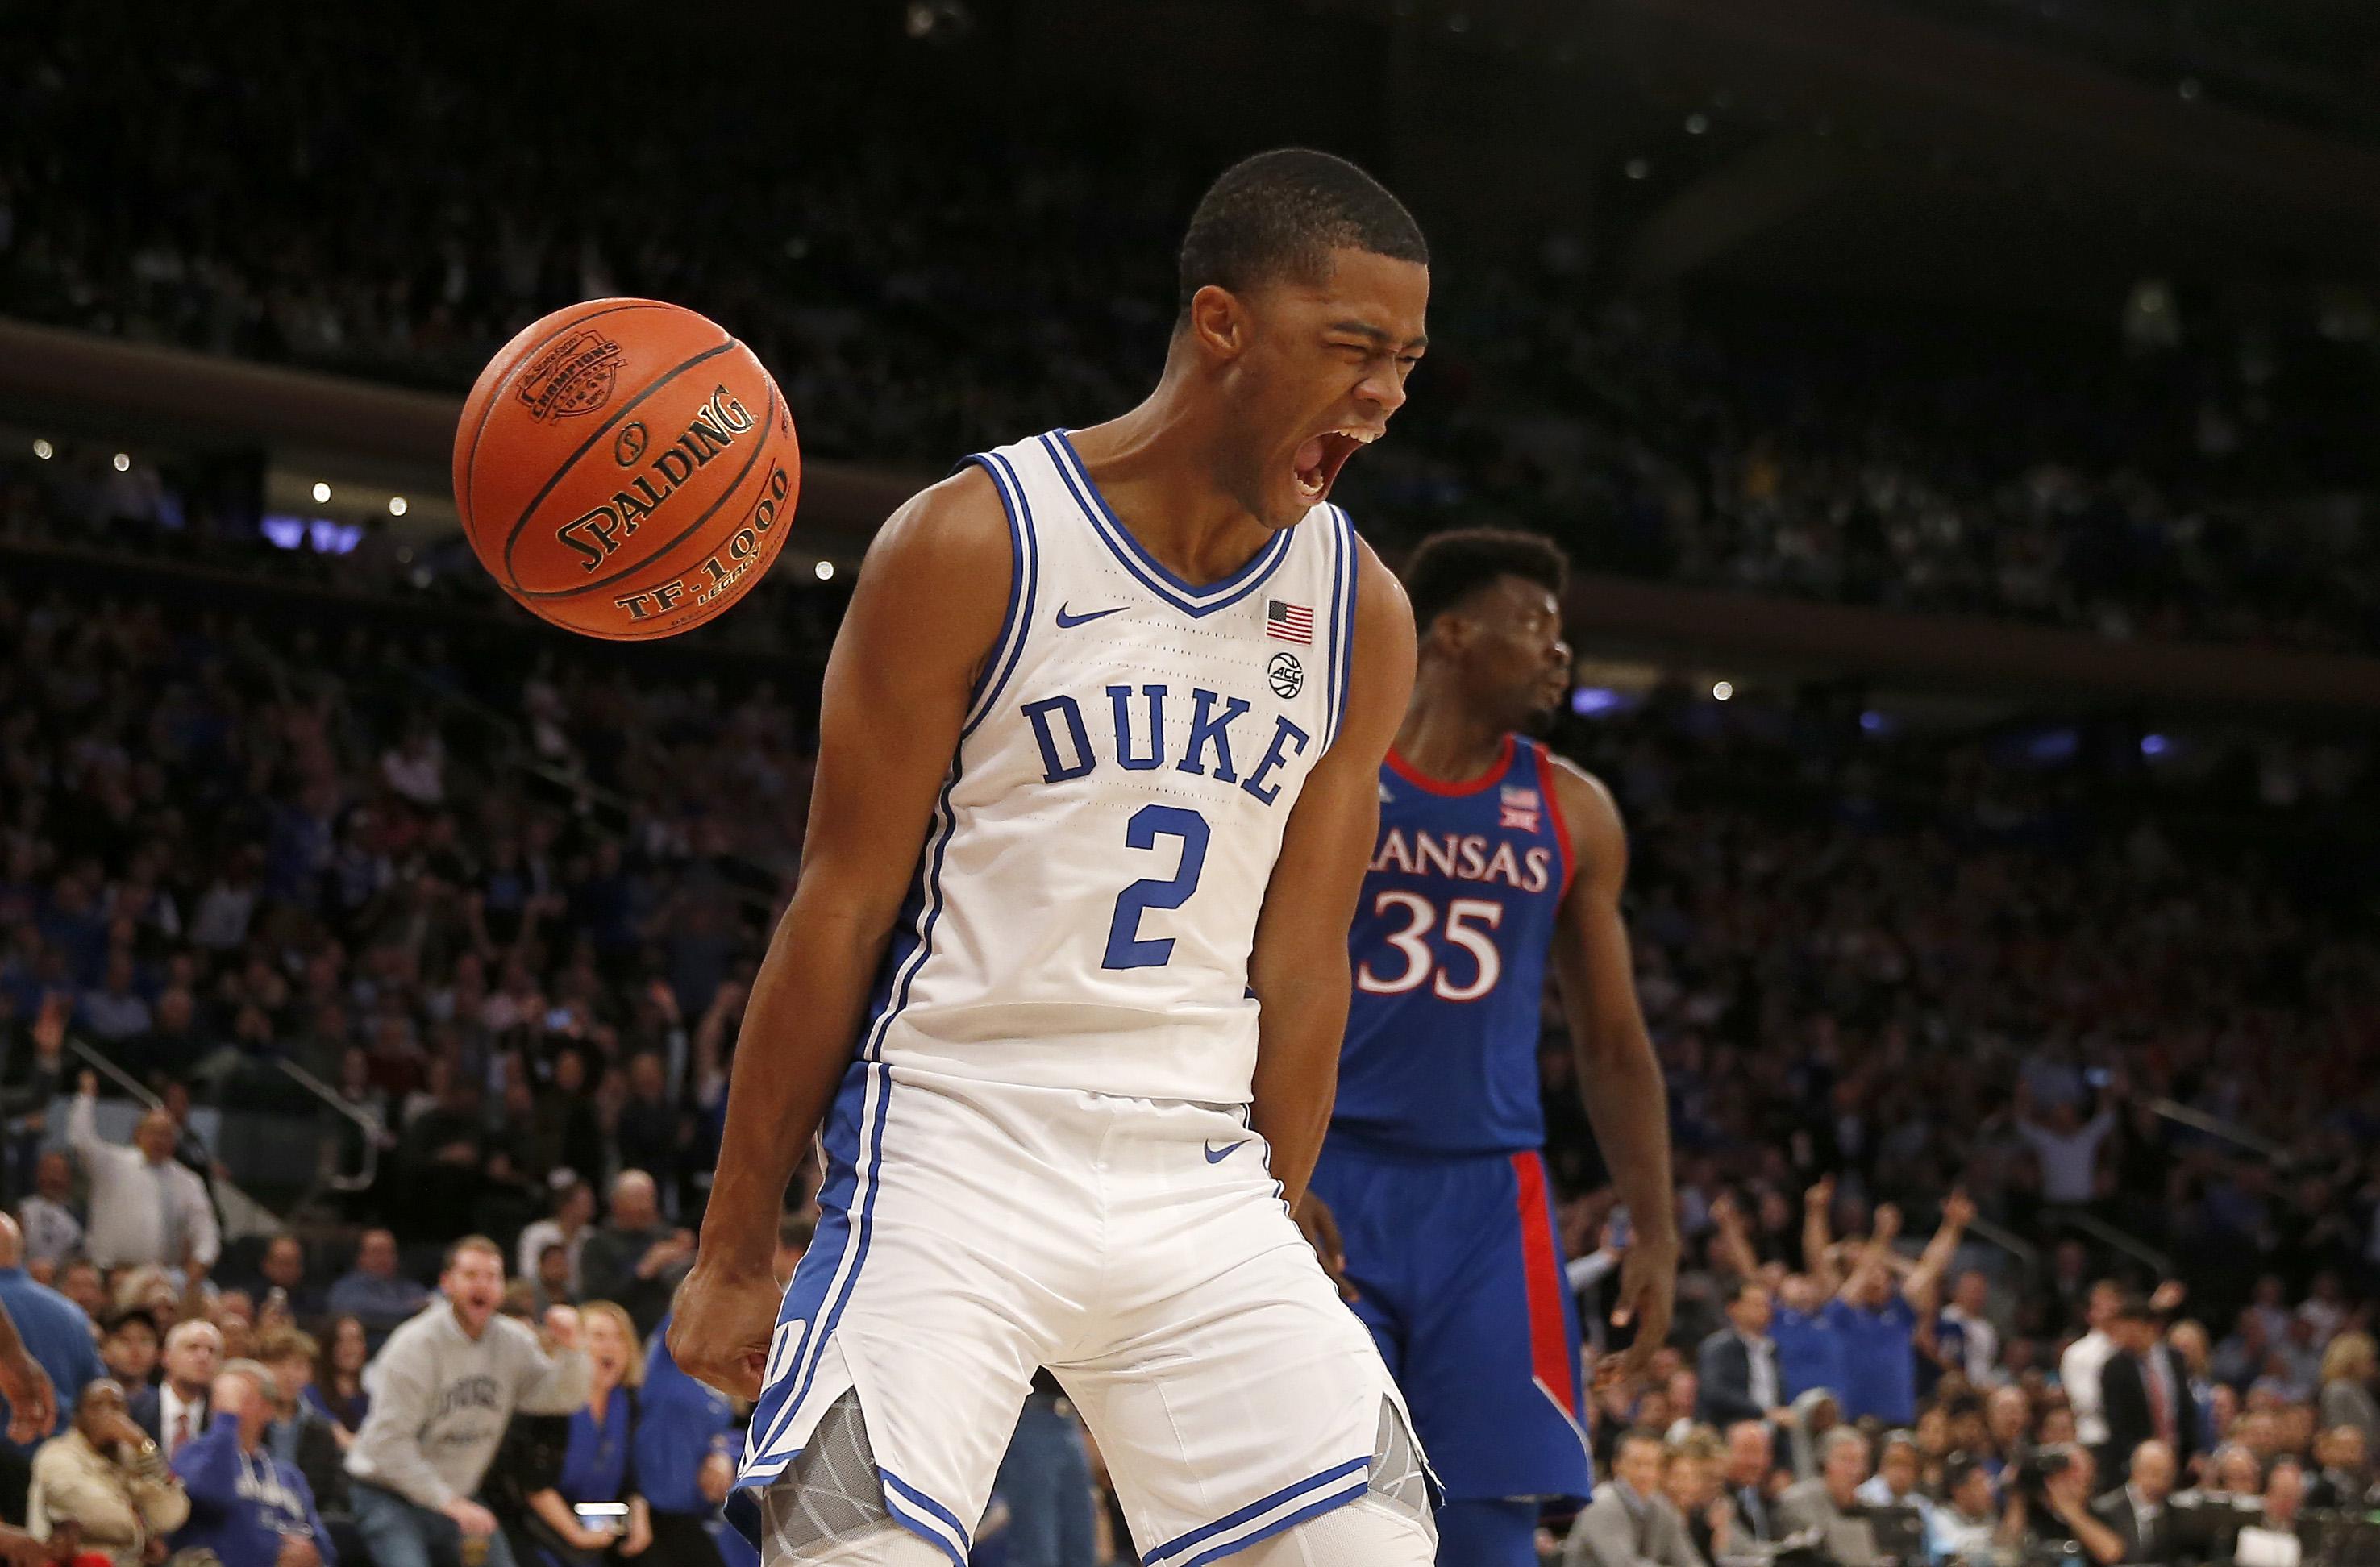 Duke basketball player